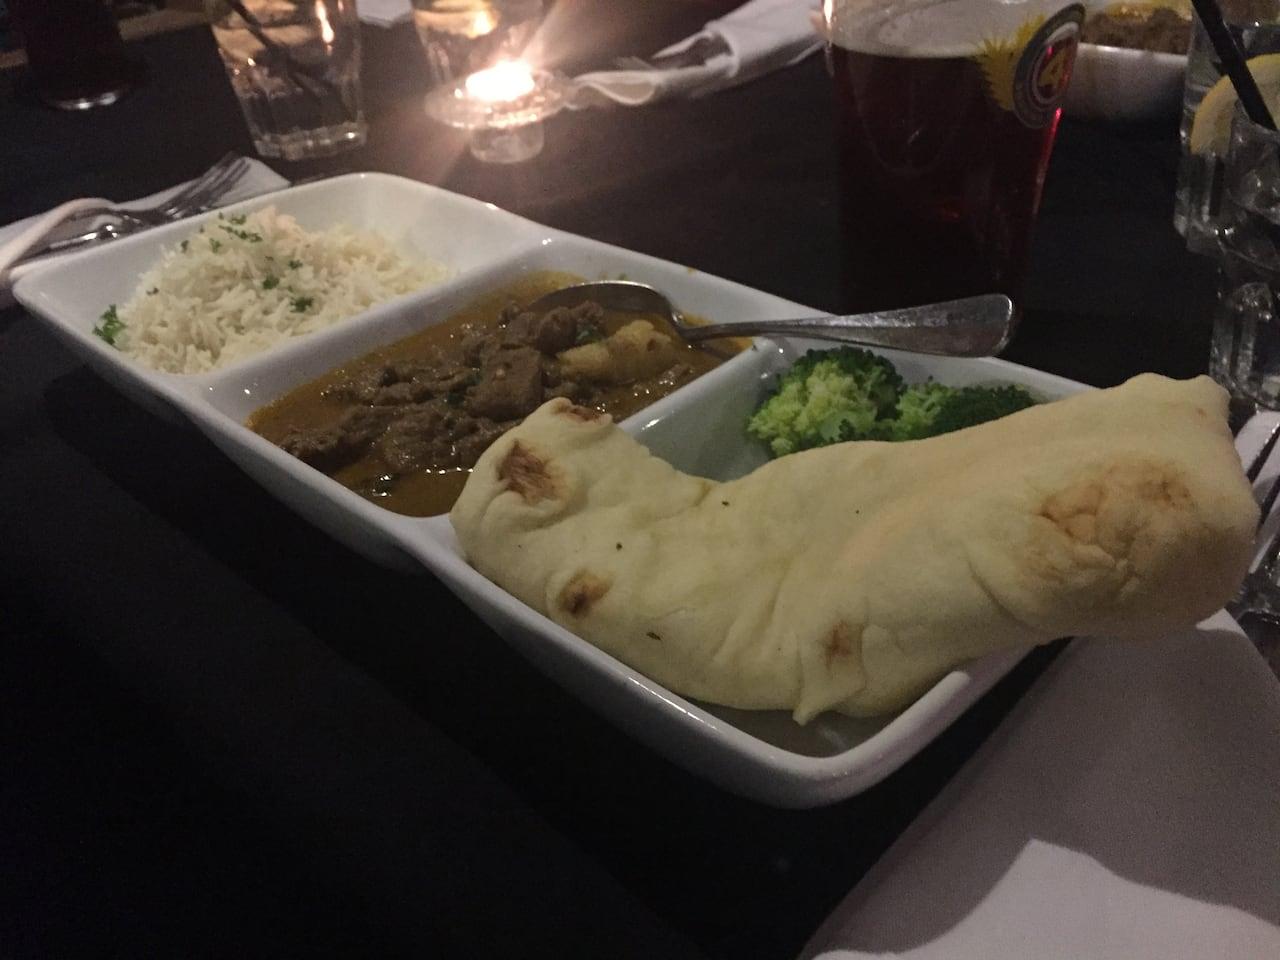 Reporteru0027s (culinary) Notebook: A Gourmandu0027s Guide To Smiths Falls   CBC  News